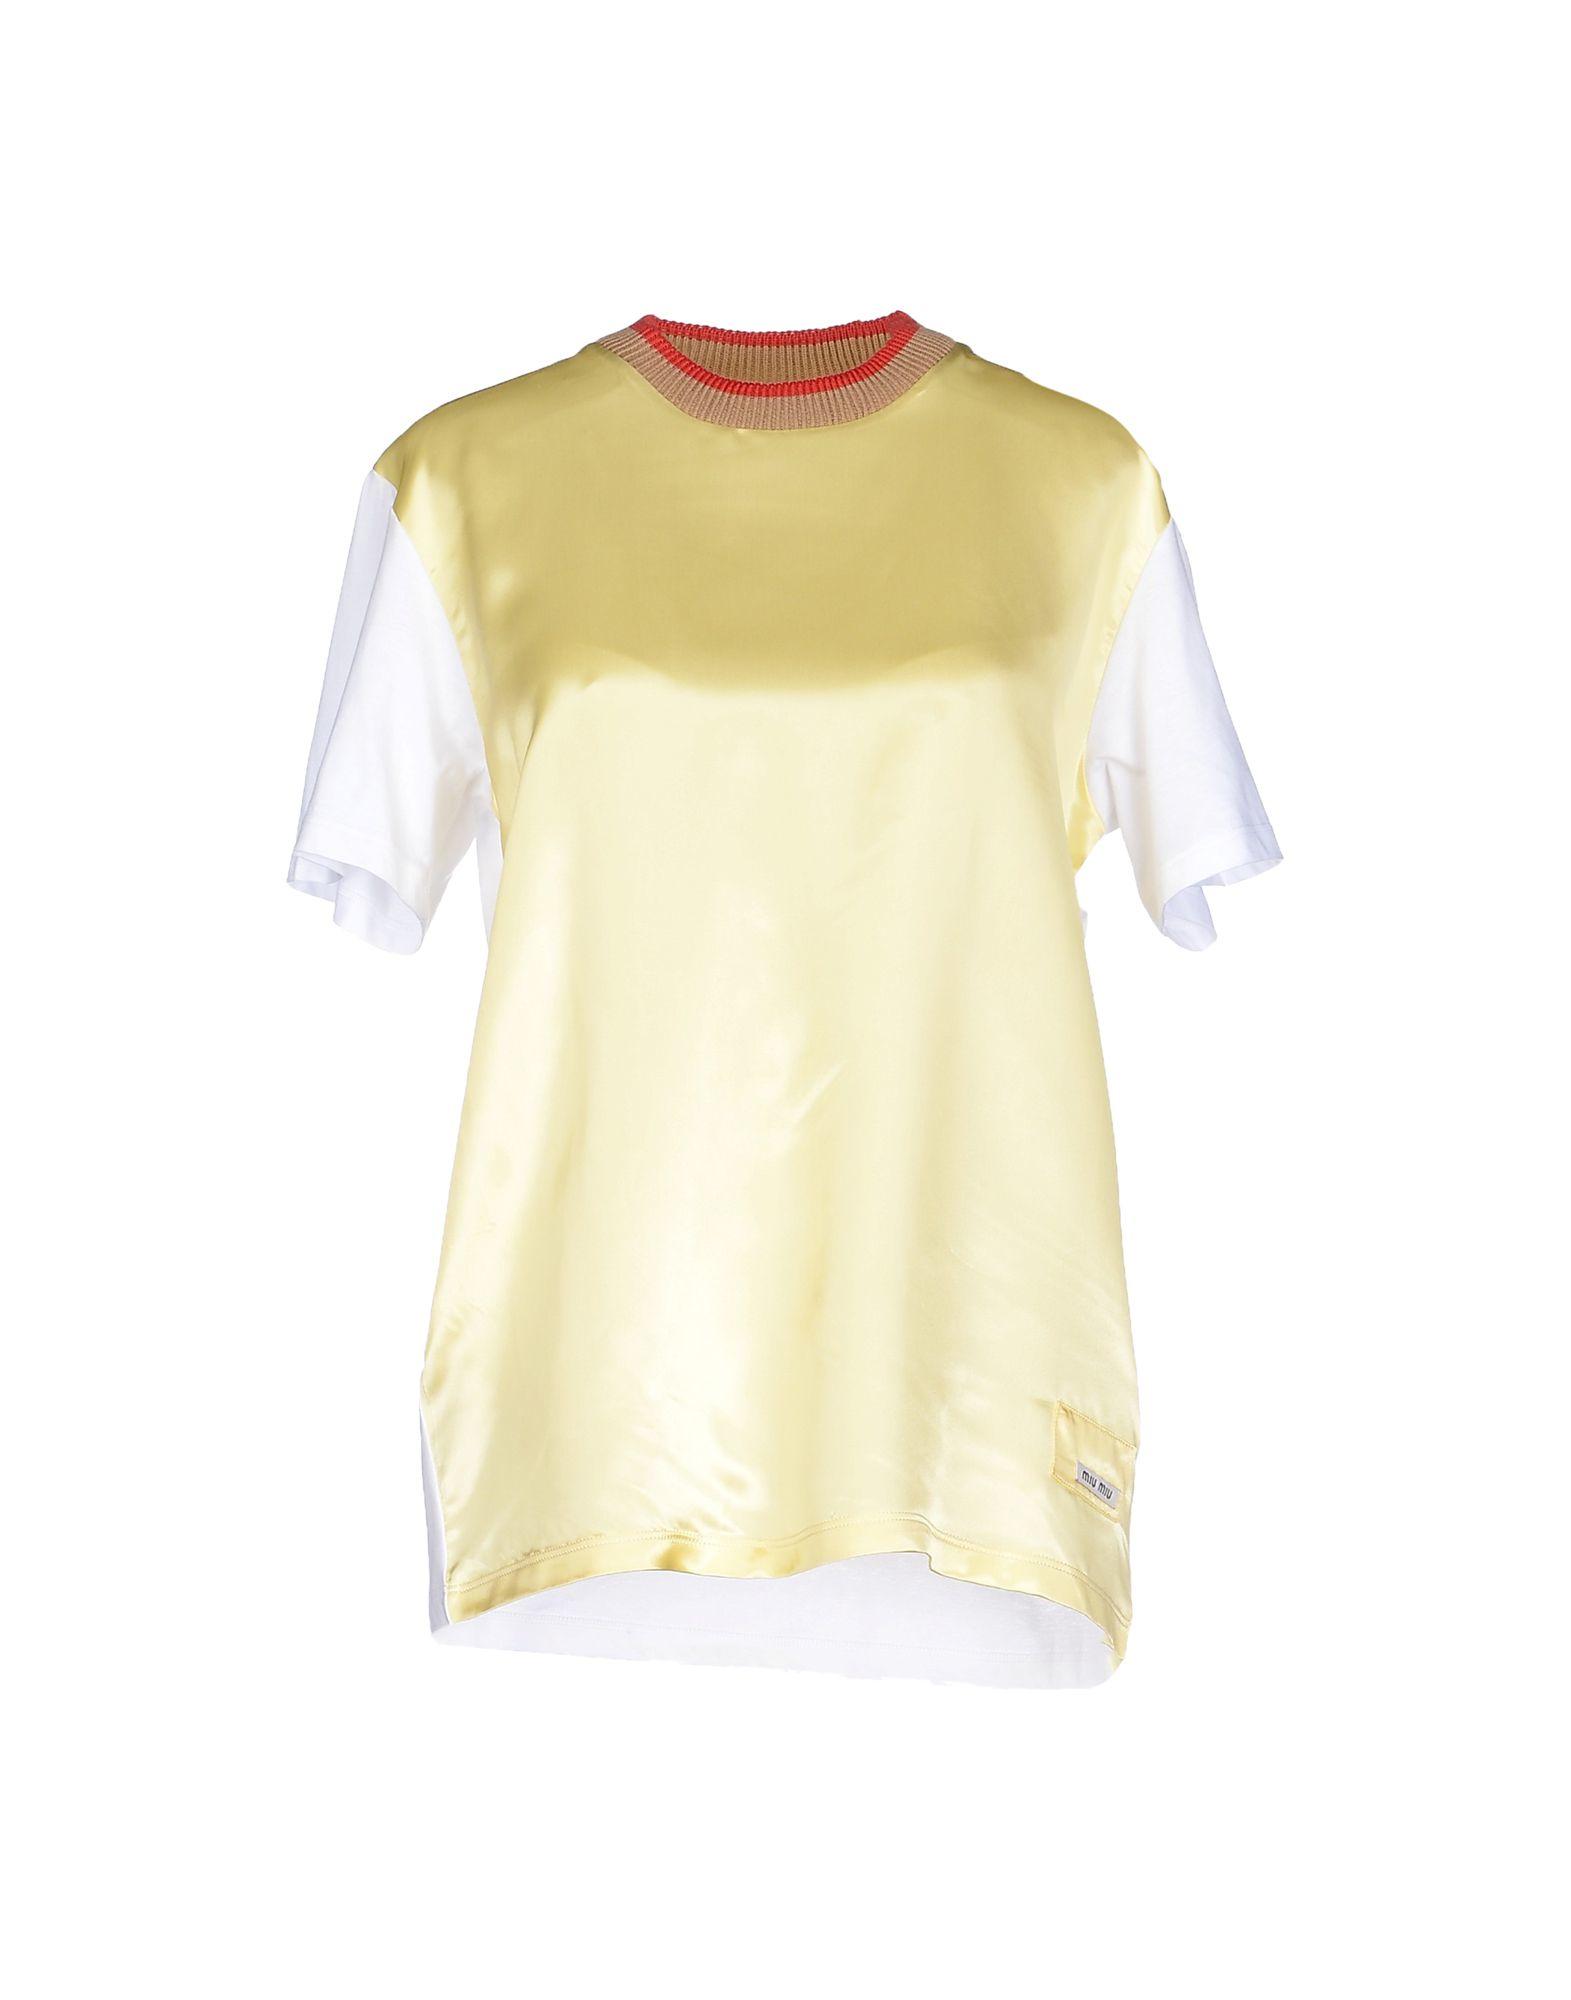 lyst miu miu t shirt in yellow